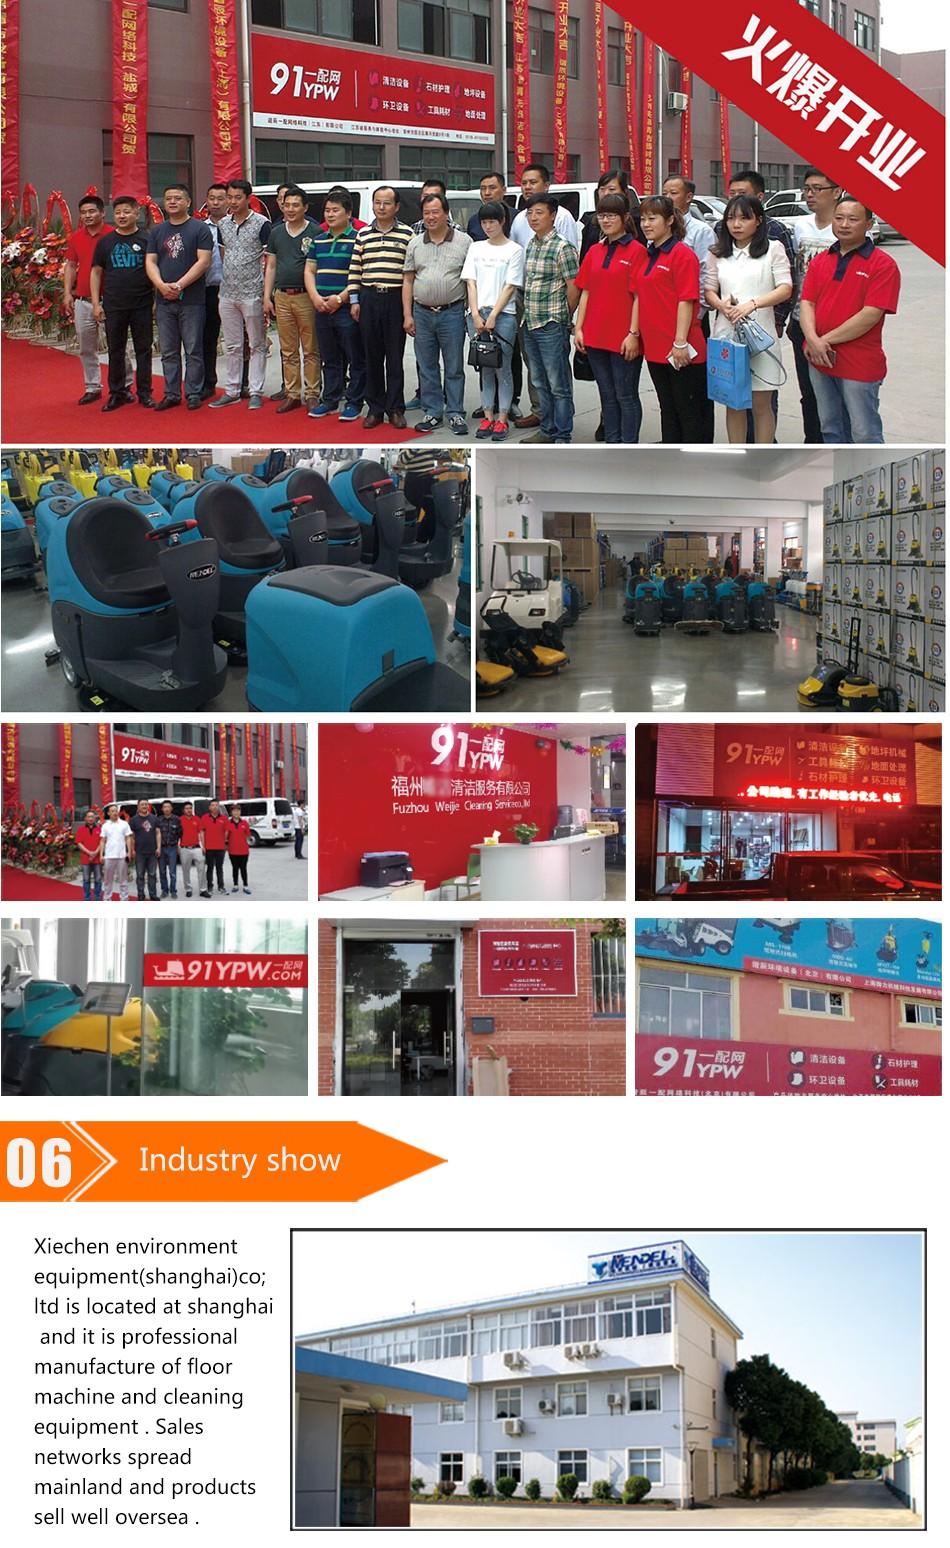 Evac train vacuum systems trading (shanghai) co. ltd